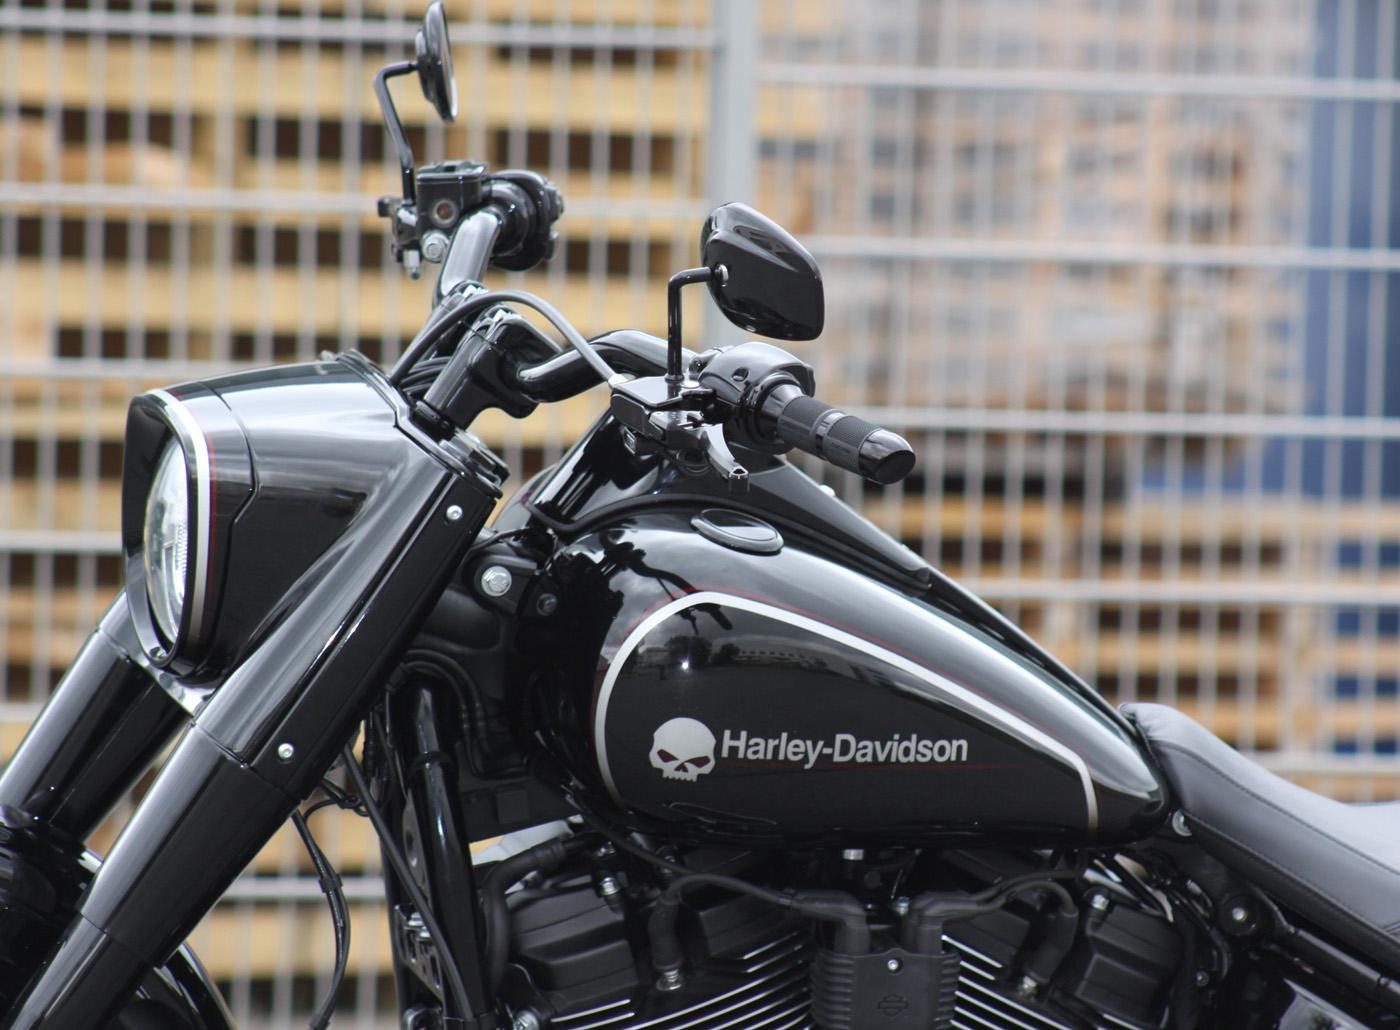 Superbike low 840 mm